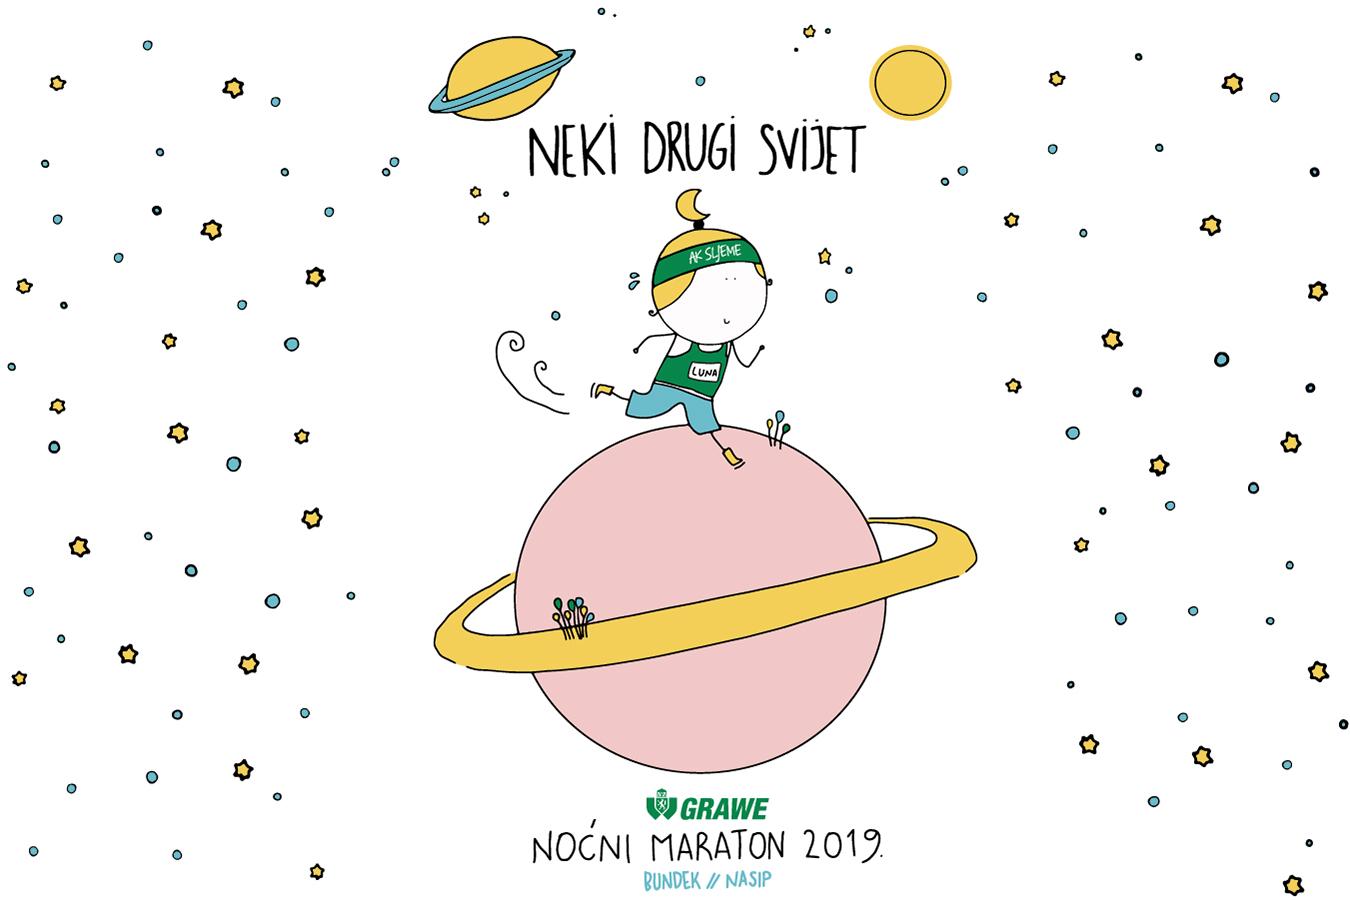 grawe-nocni-maraton-2019